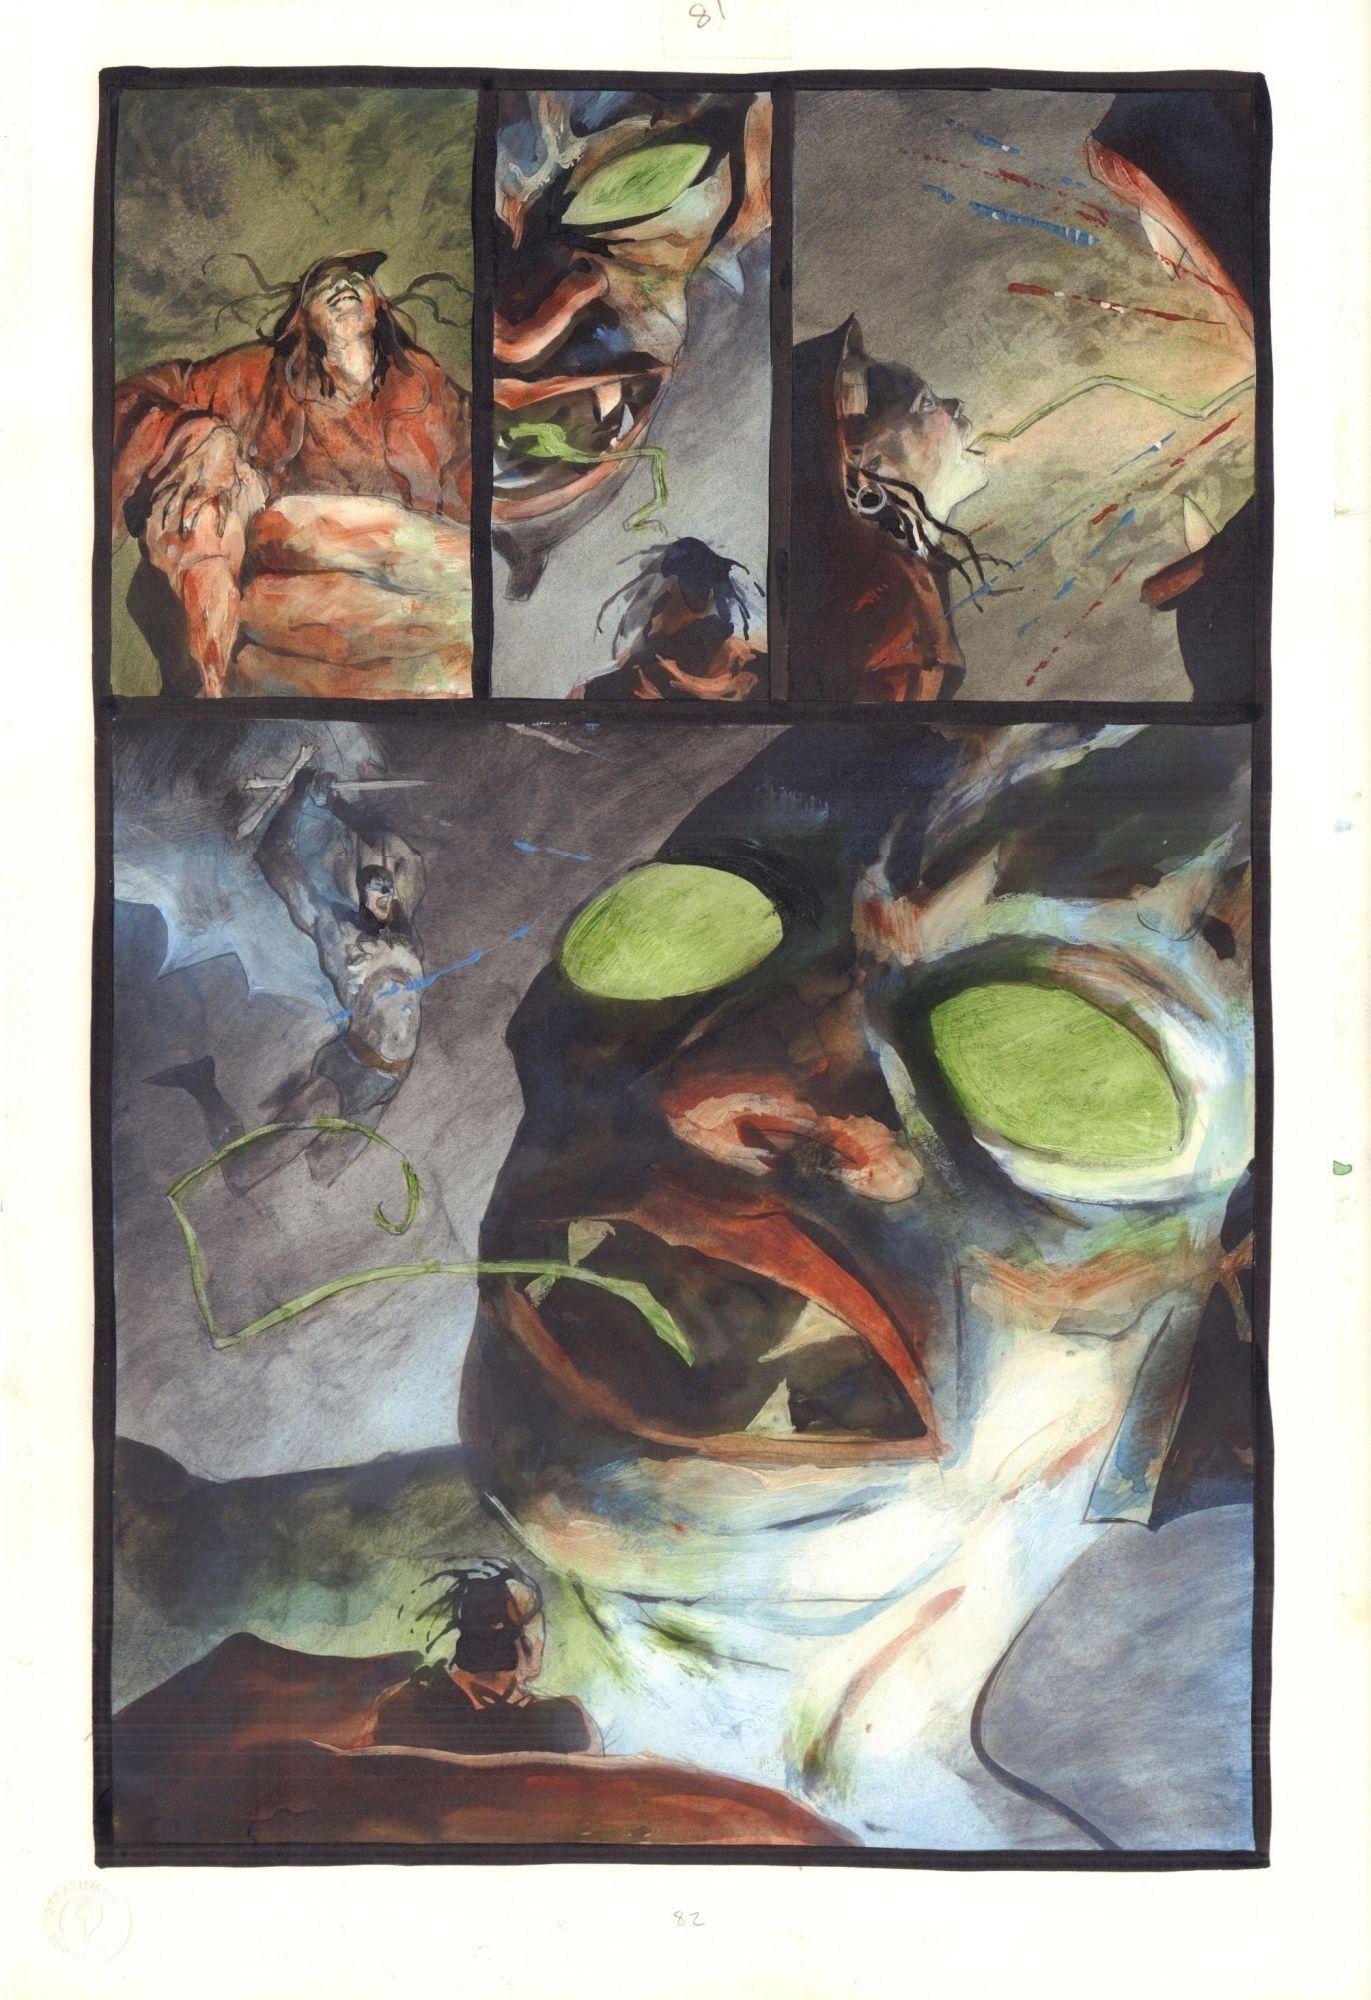 Batman: Harvest Breed, s 80